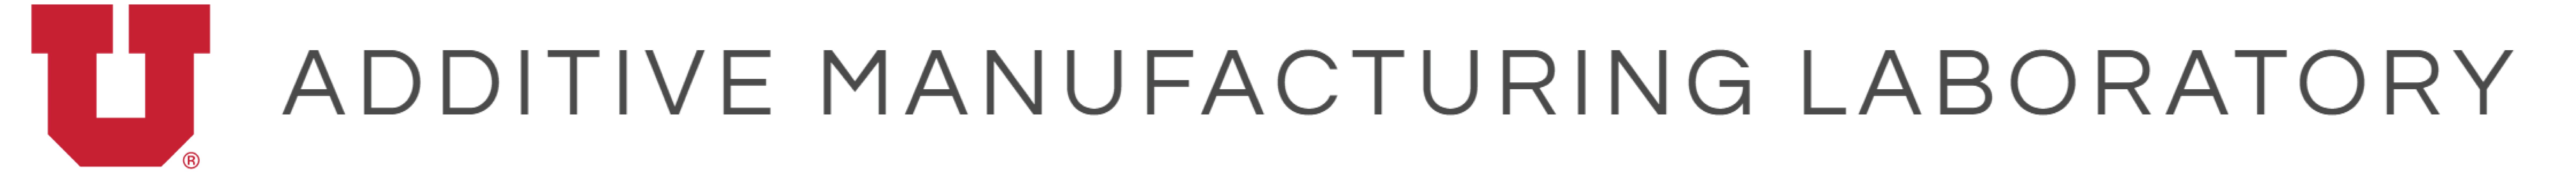 Additive Manufacturing Laboratory Logo